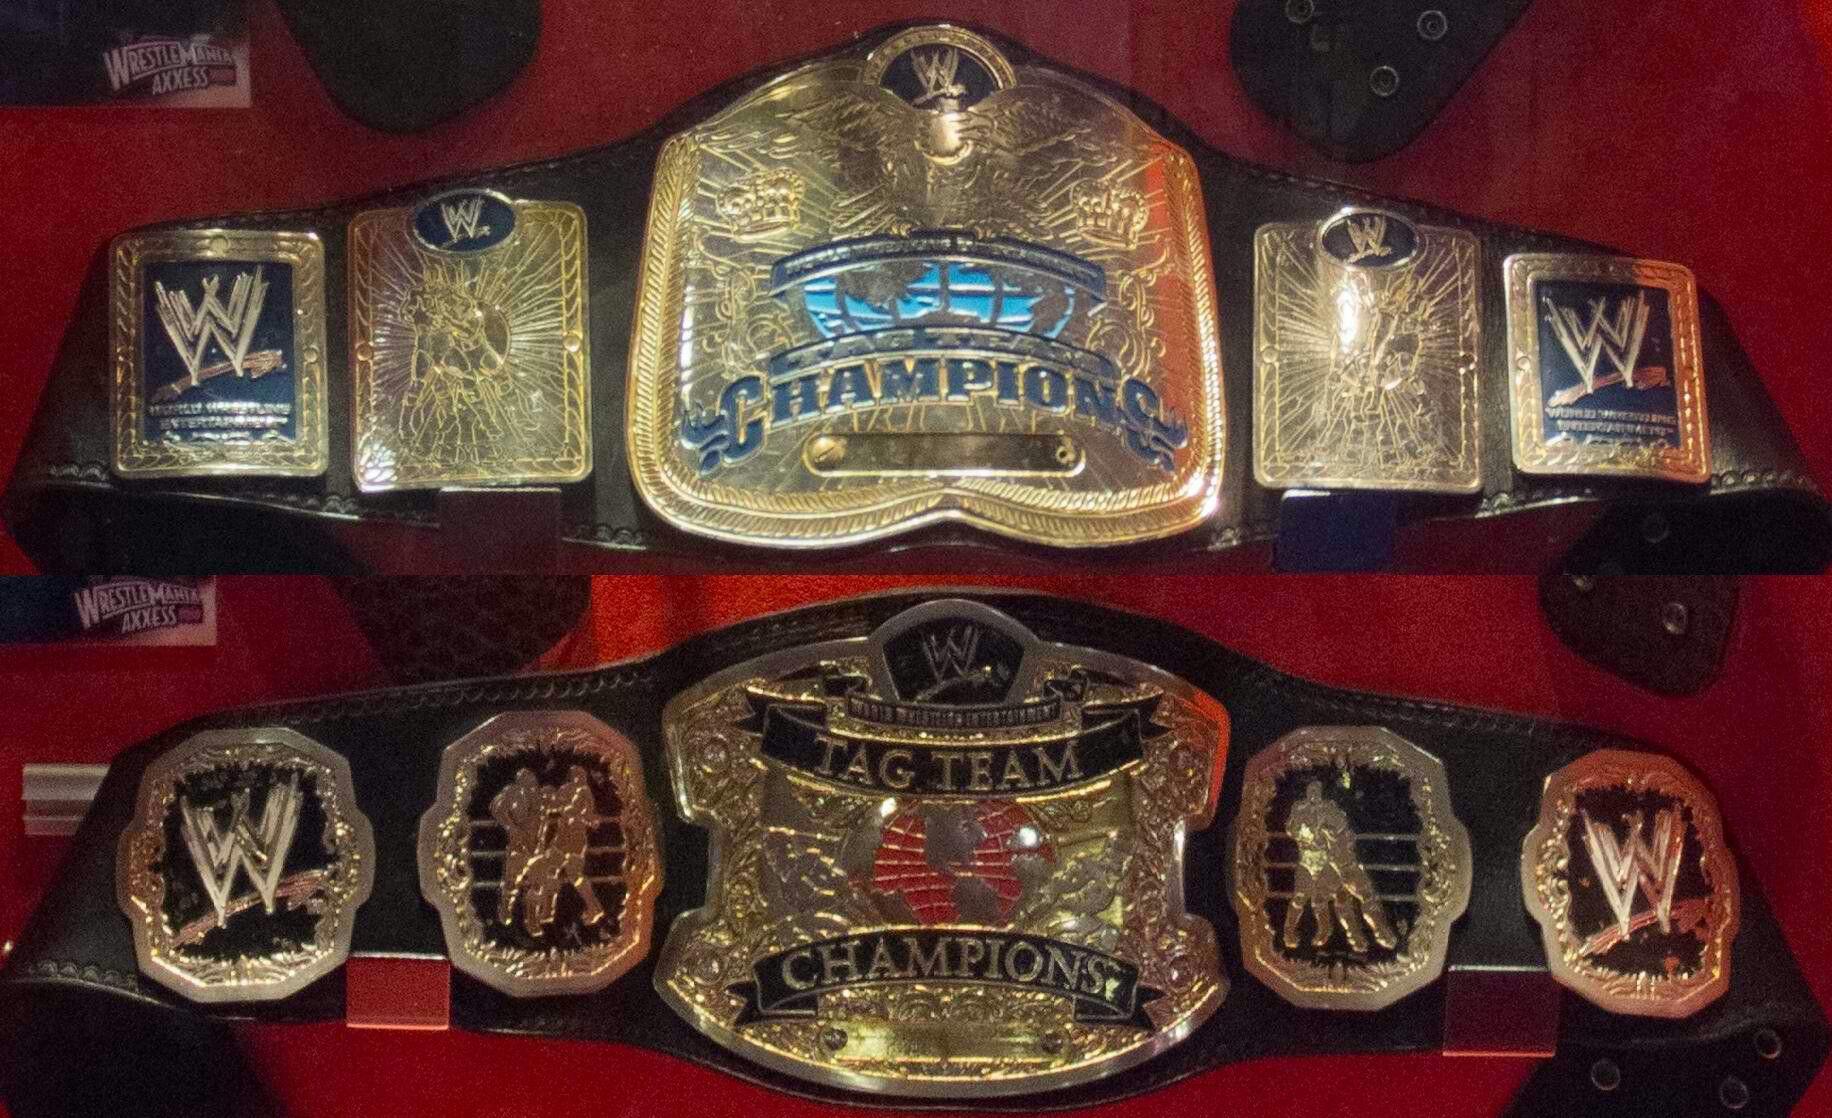 NEW RAW TAG TEAM SMACKDOWN TITLE WRESTLING CHAMPIONSHIP BELT WWF FIGHTING BELT